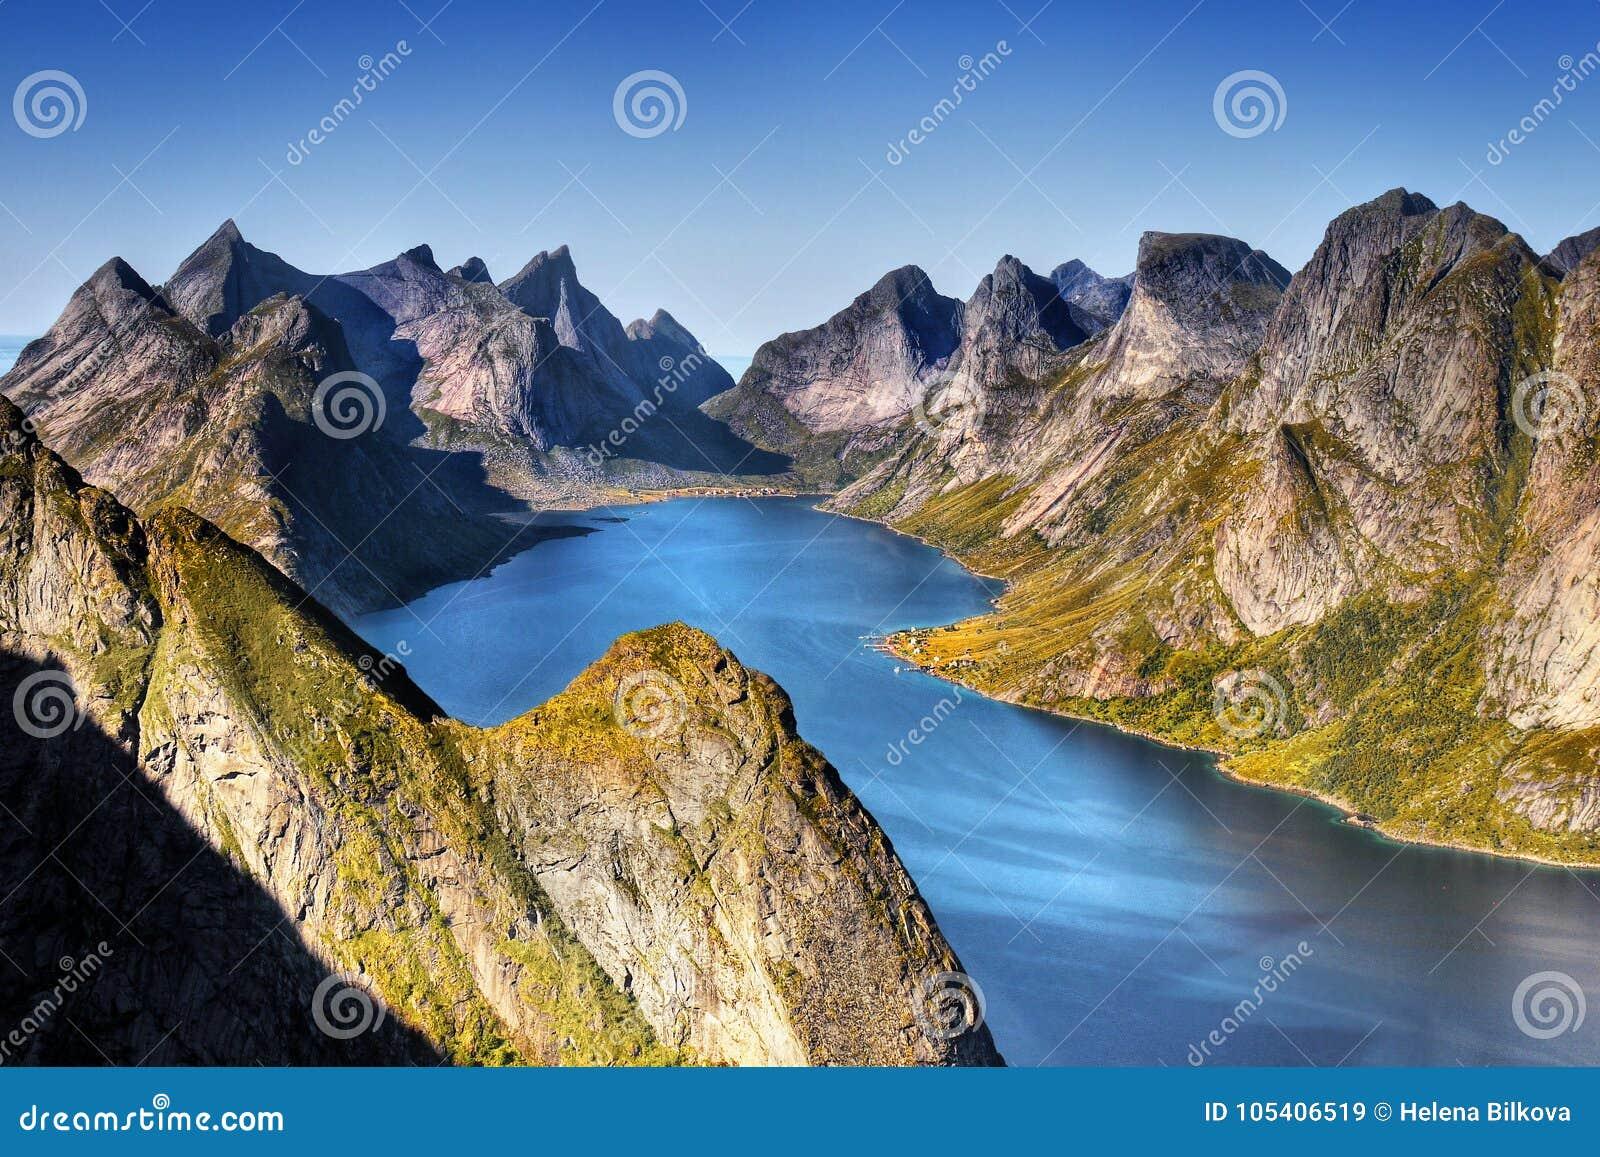 Download Νορβηγία, νησιά Lofoten, φιορδ βουνών τοπίων ακτών Στοκ Εικόνα - εικόνα από τοπίο, υπαίθριος: 105406519